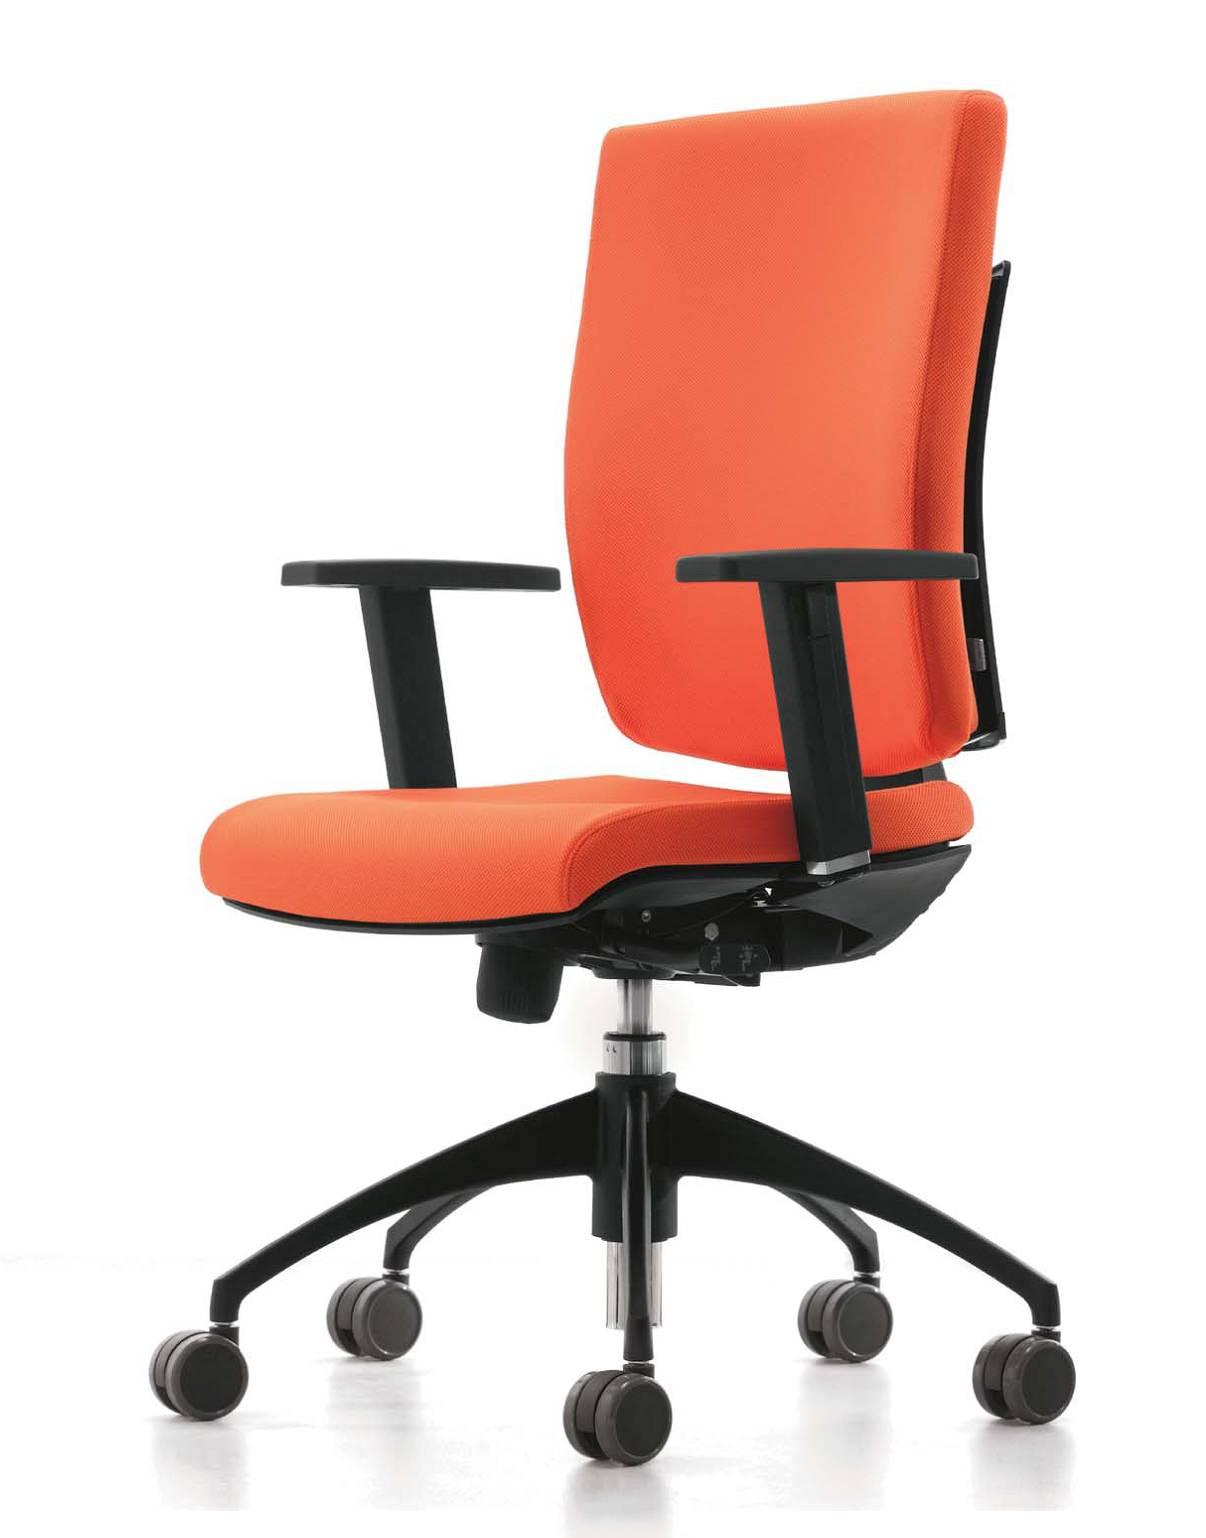 seduta_operativa_ufficio_ergonomica_struttura_nera_seduta_rossa_pixel_luxy